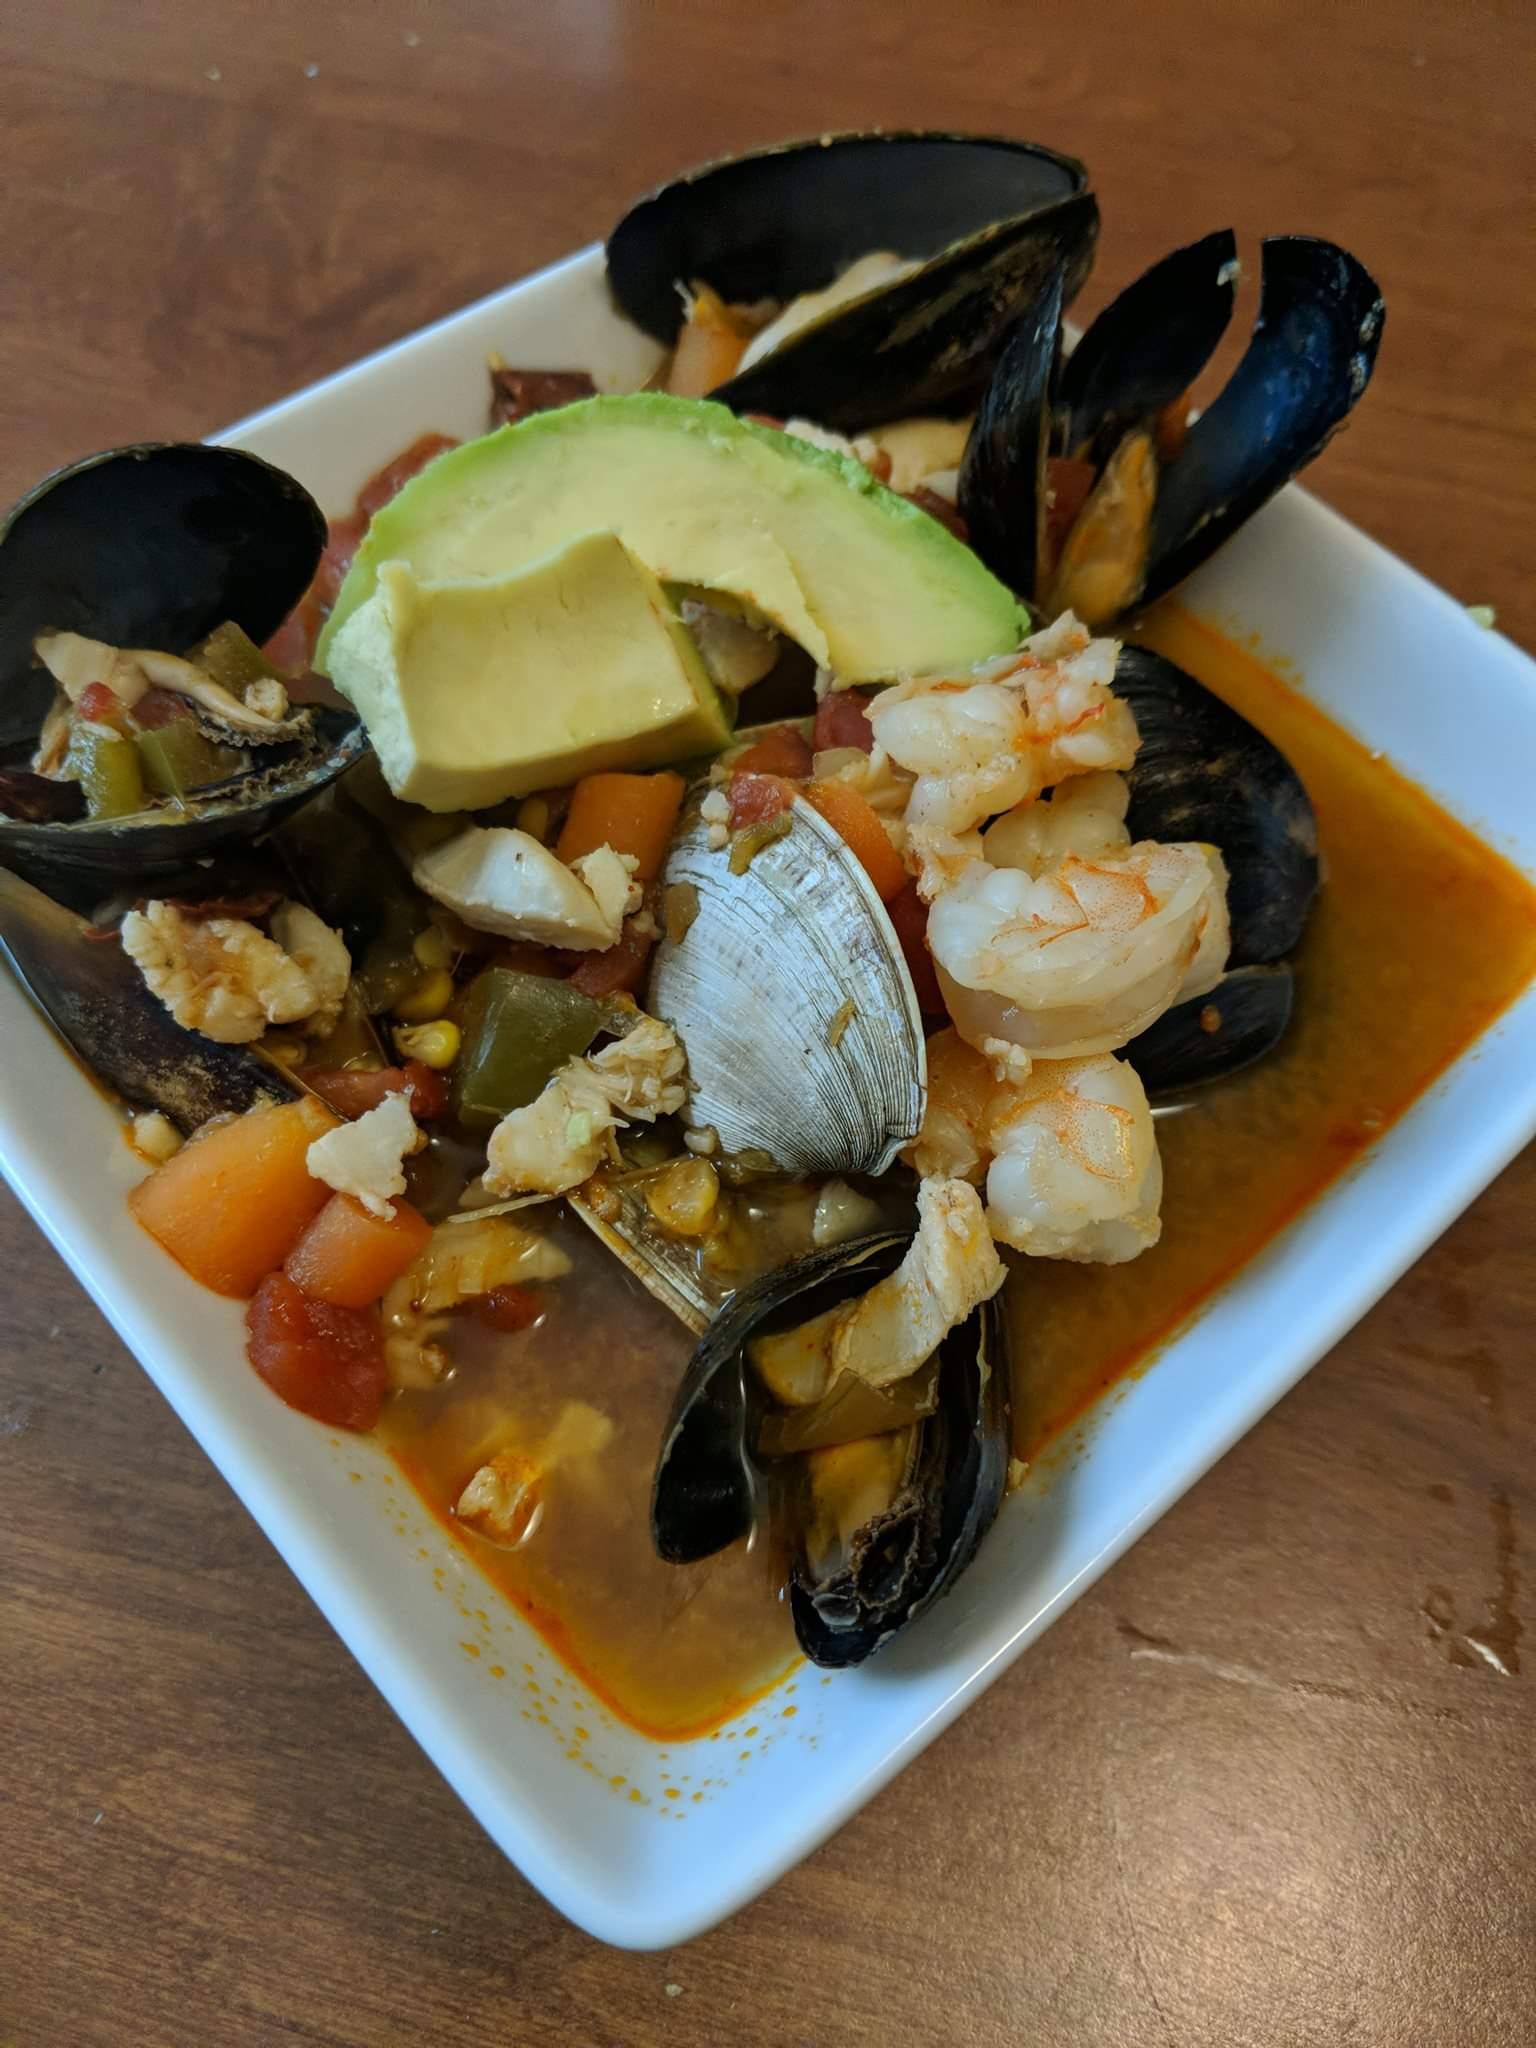 Sopa de Mariscos (Seafood Soup)